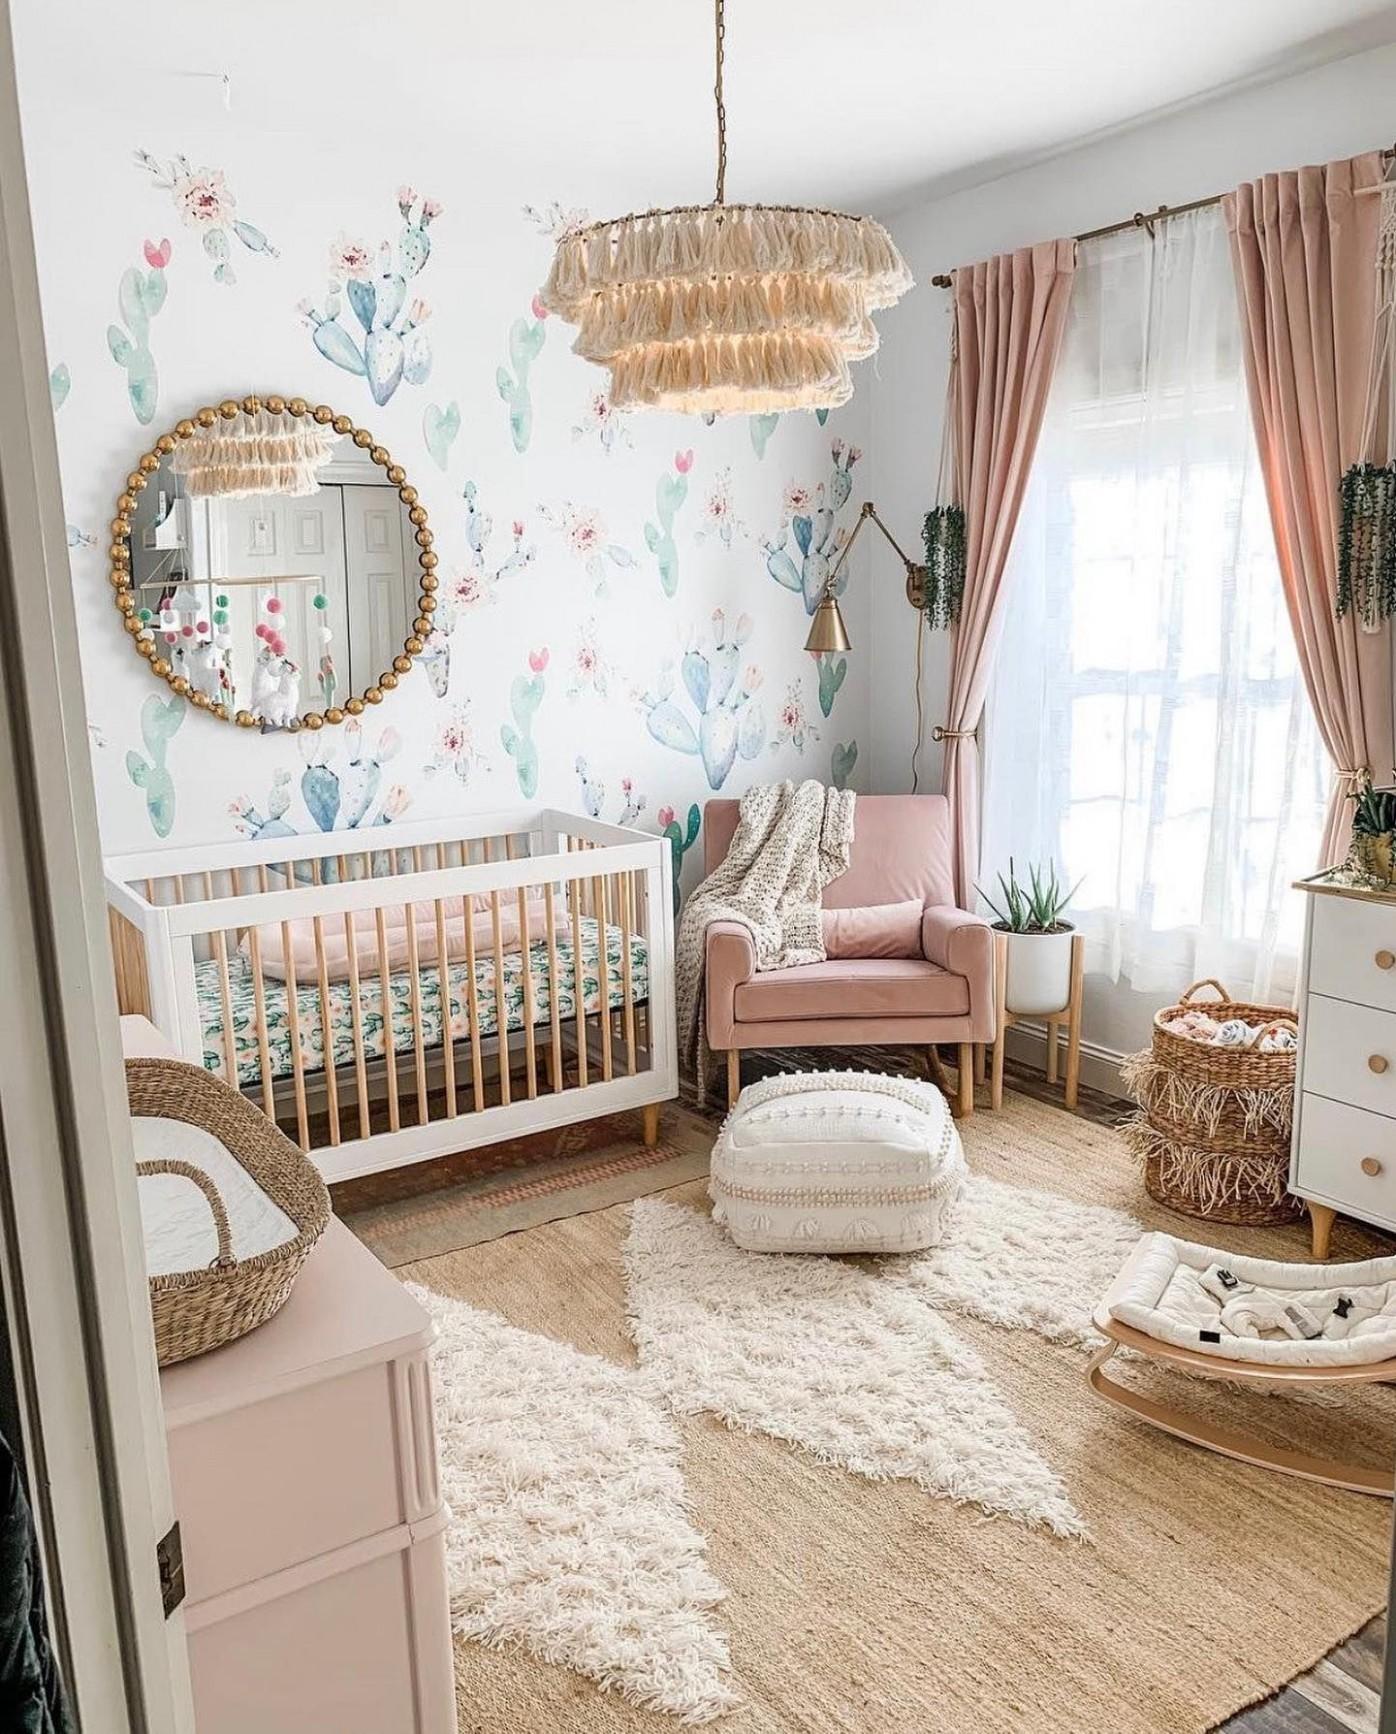 Cactus Decals in Boho Baby Girl Nursery in 10  Girl nursery  - Baby Room Girl